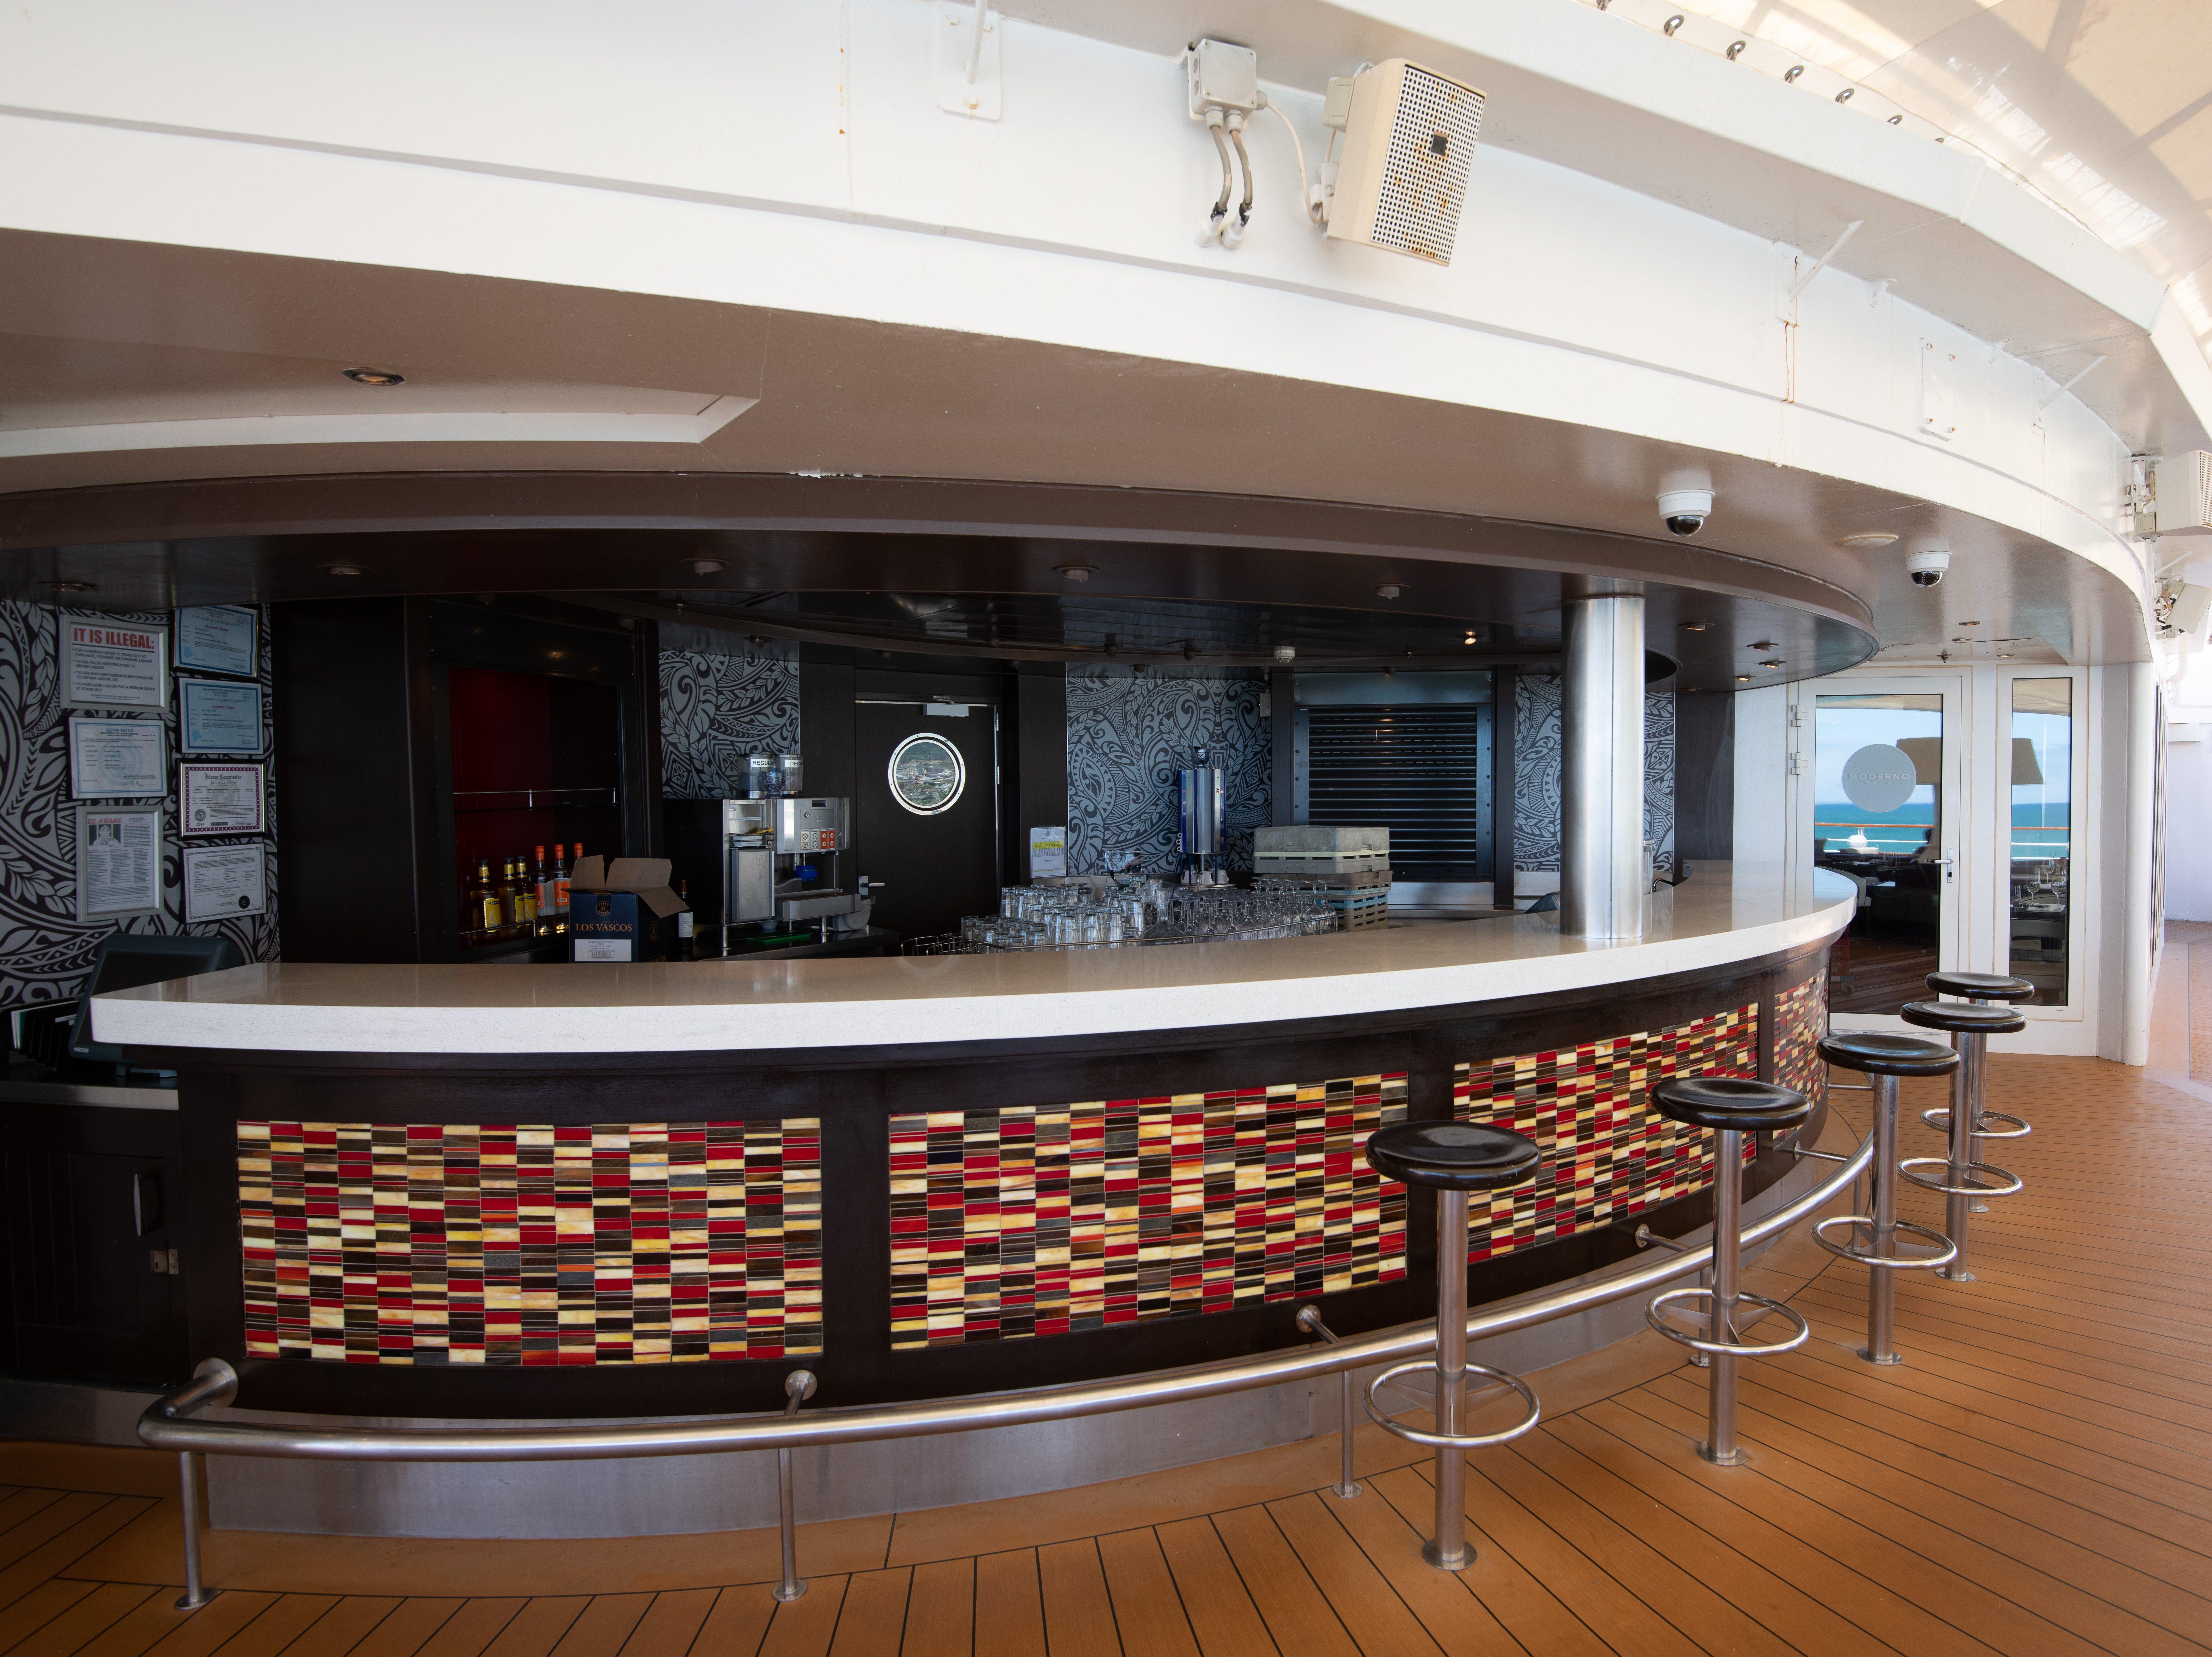 The Aloha Lanai Bar overlooks the back of Pride of America on Deck 11.